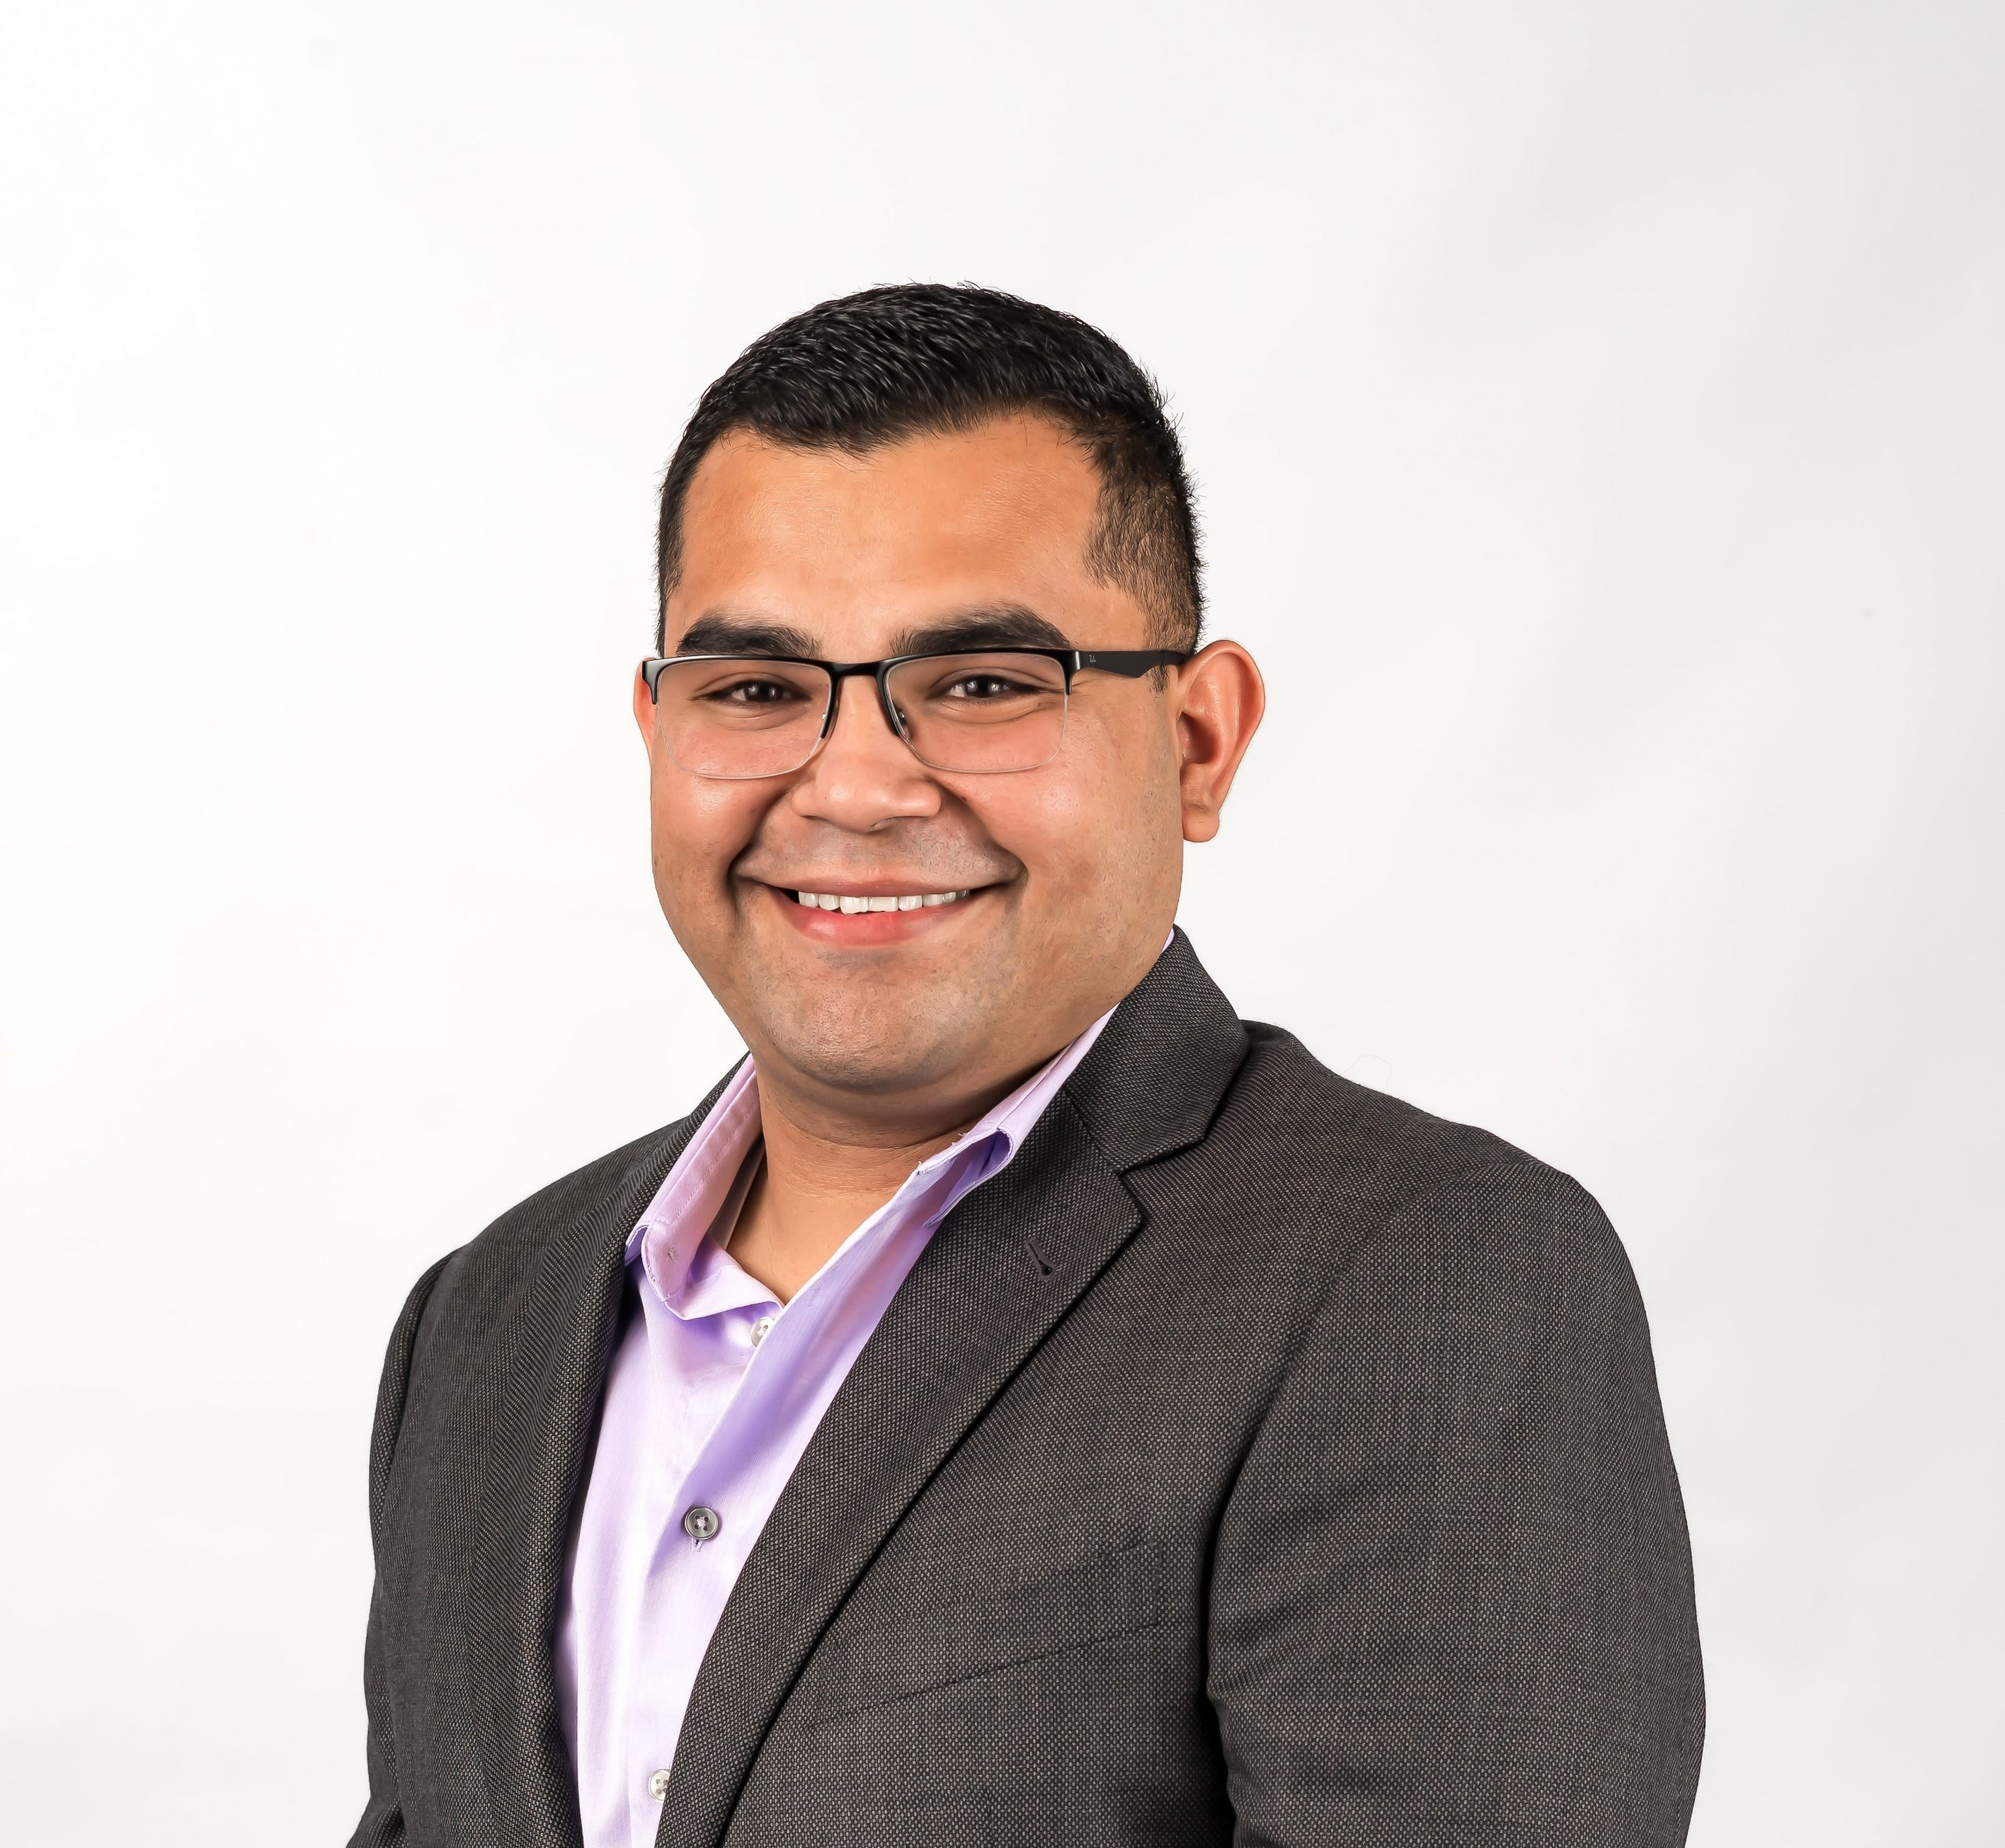 Roy Vega Carranza Insurance Agent